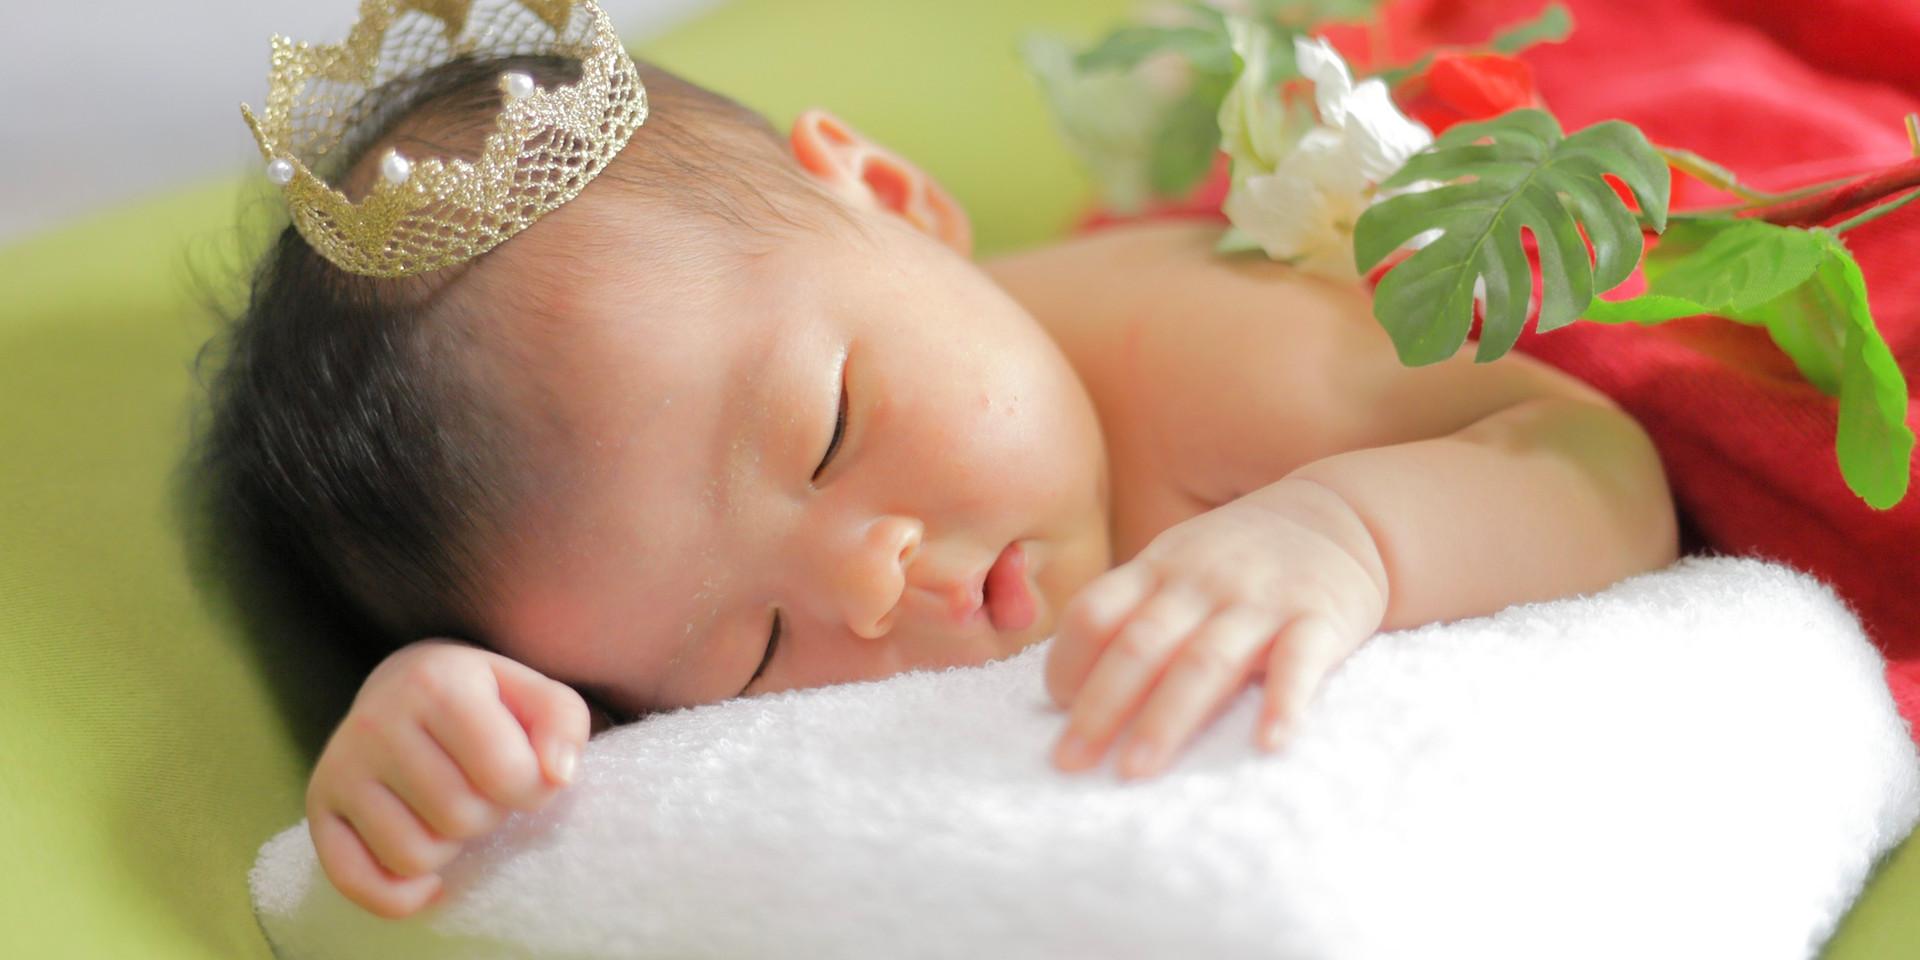 child.photo6.jpg